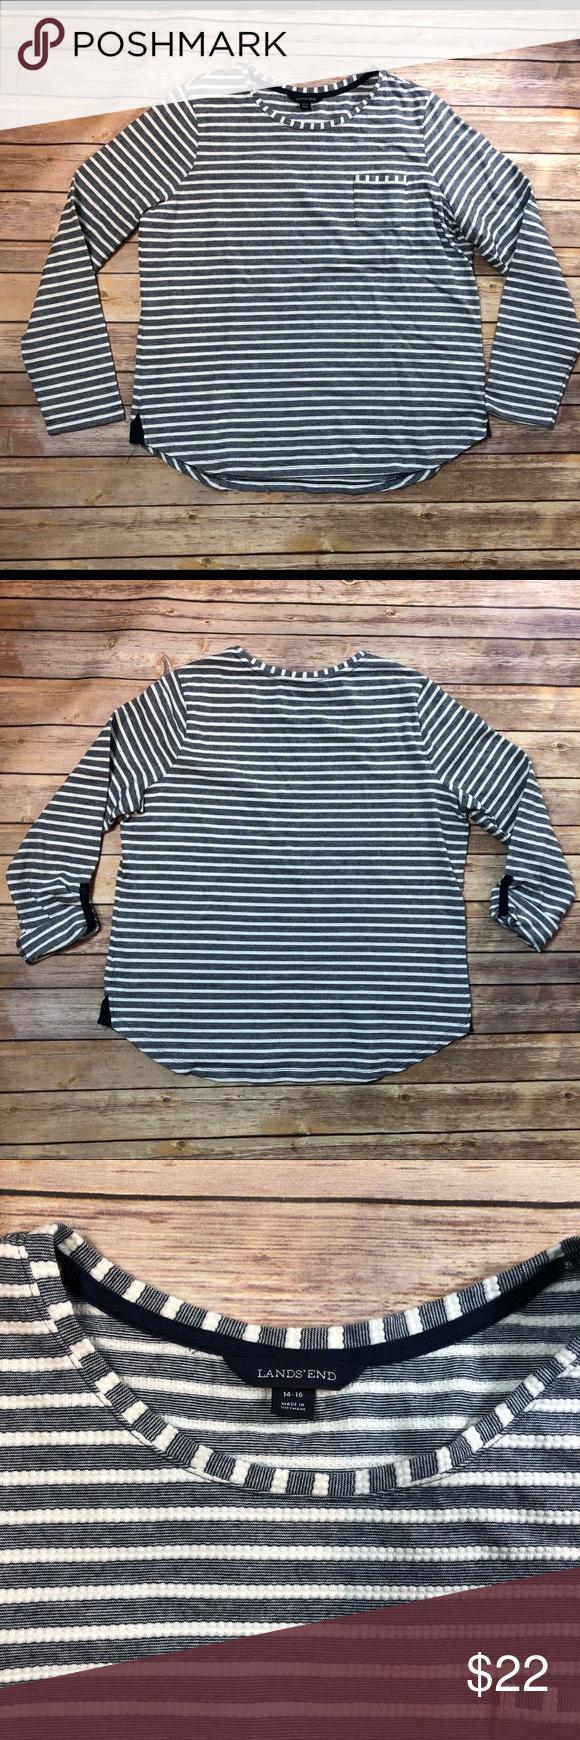 Lands End Women S Nautical Striped Shirt Size 14 Striped Shirt Navy White Striped Shirt Shirt Size [ 1740 x 580 Pixel ]